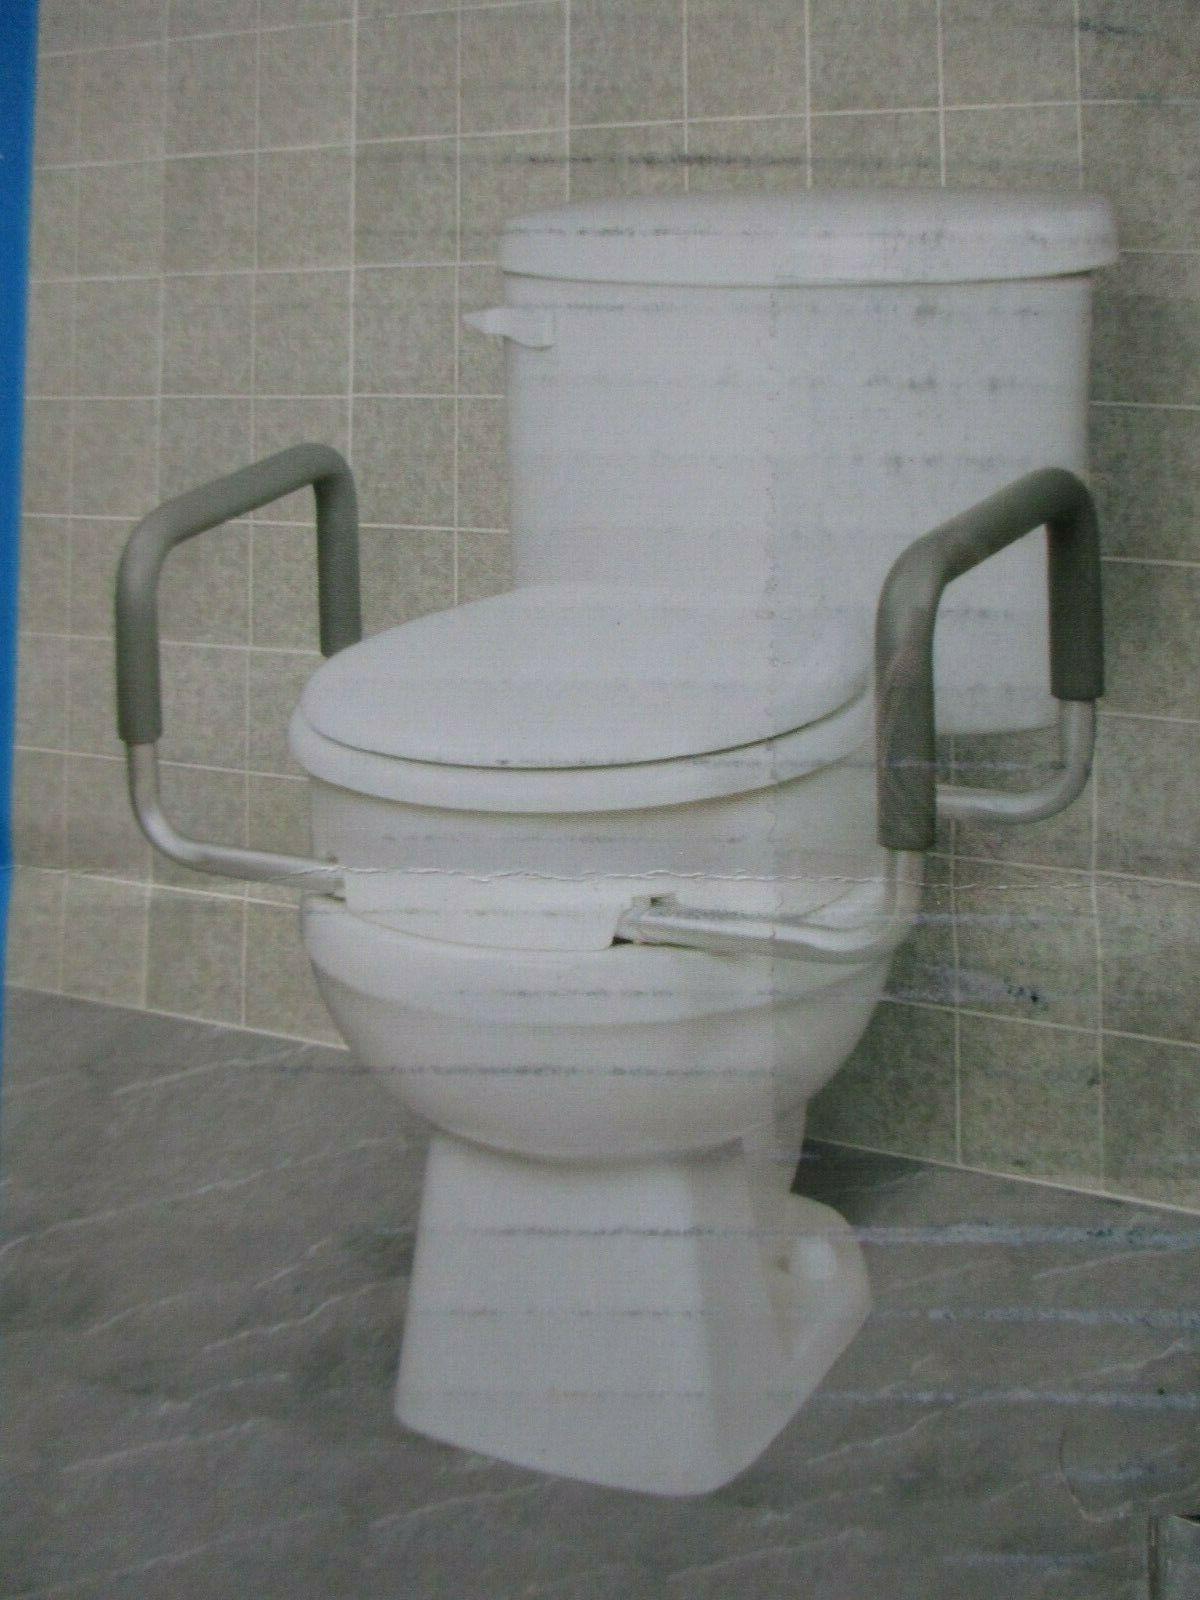 3 5 raised toilet seat with handles